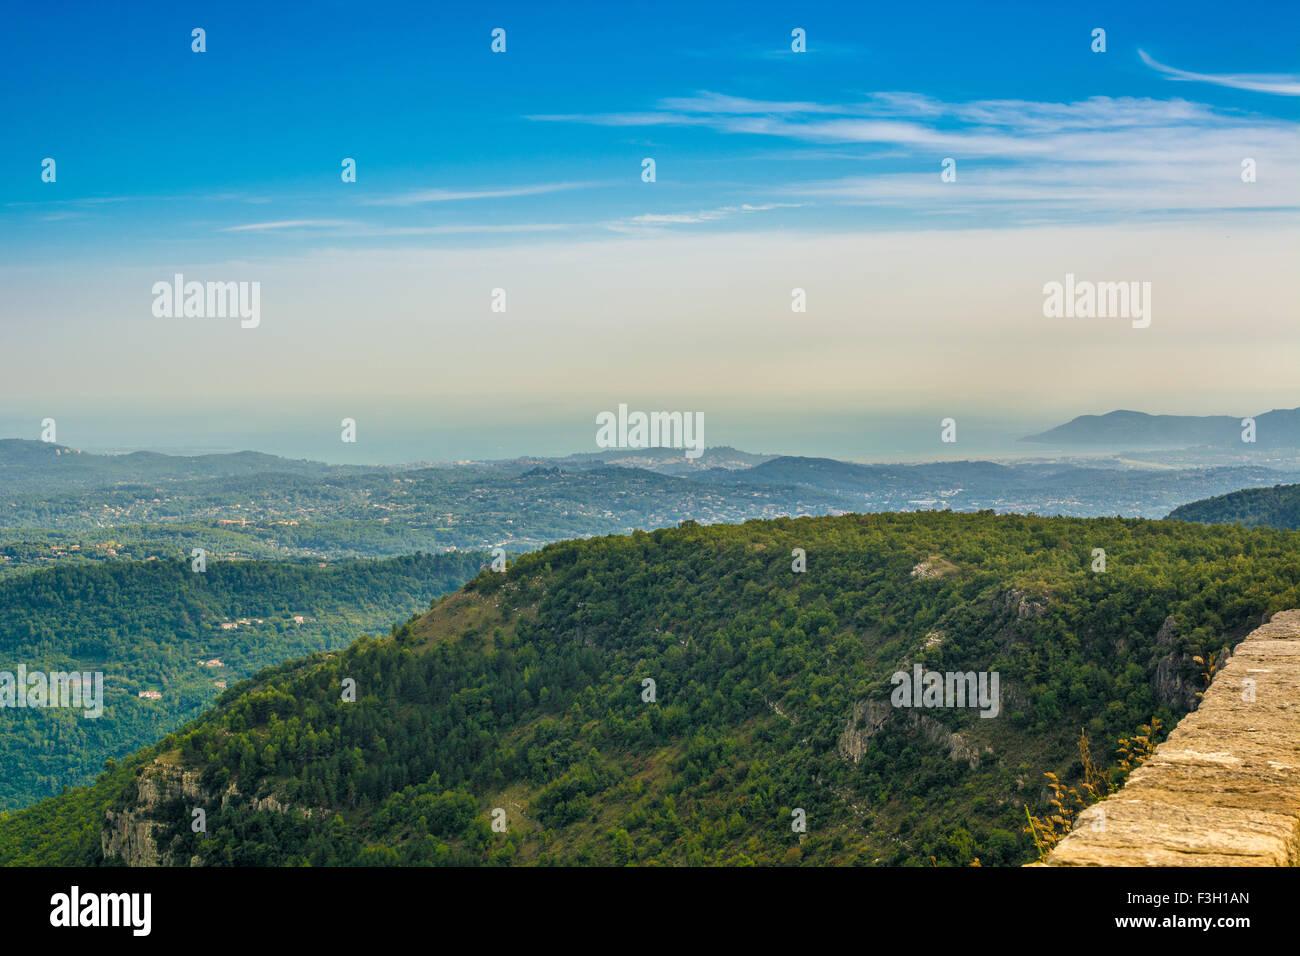 photo of mediterraneen landscape in altitude - Stock Image